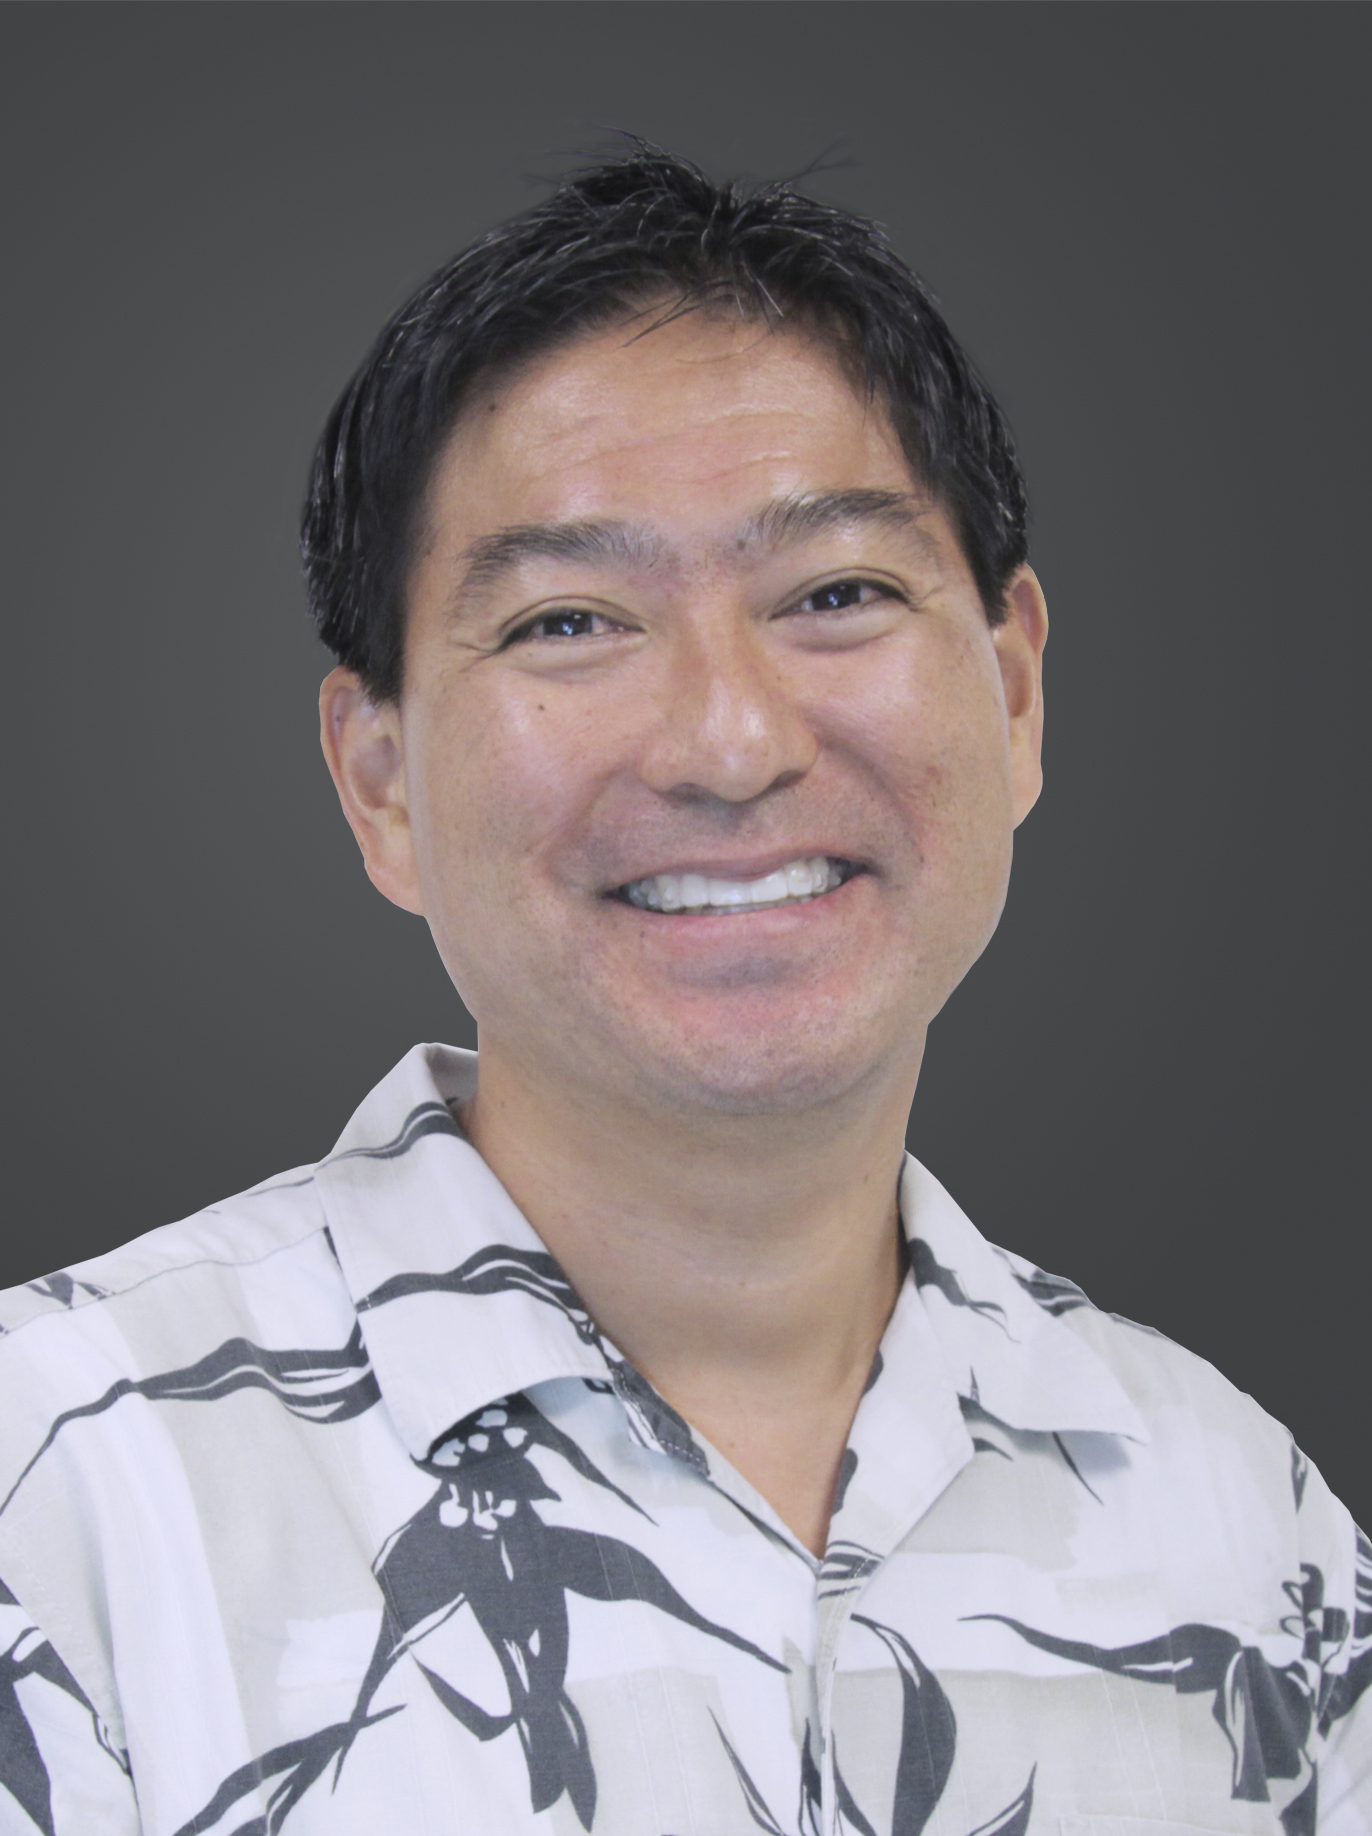 Kyle Ginoza. Photo provided by Hawai'i Gas.